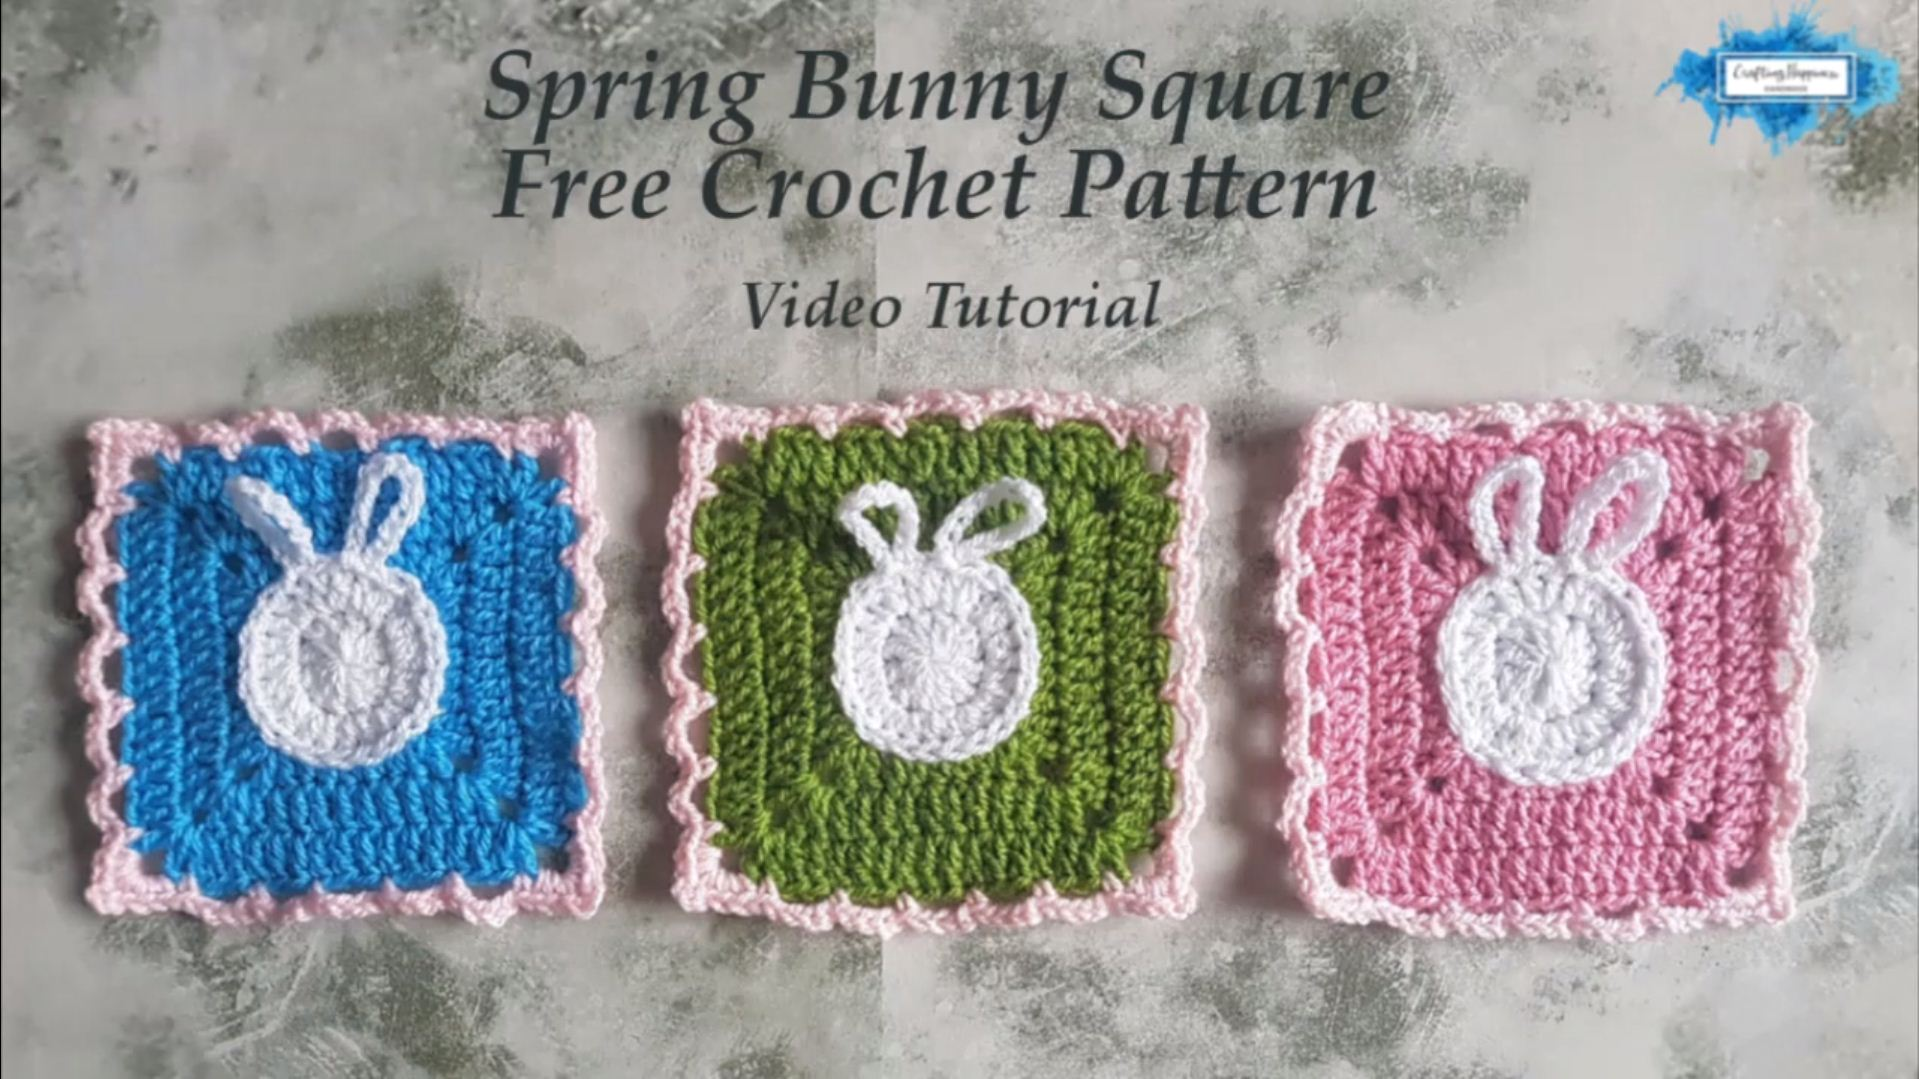 Bunny Square Free Crochet Pattern